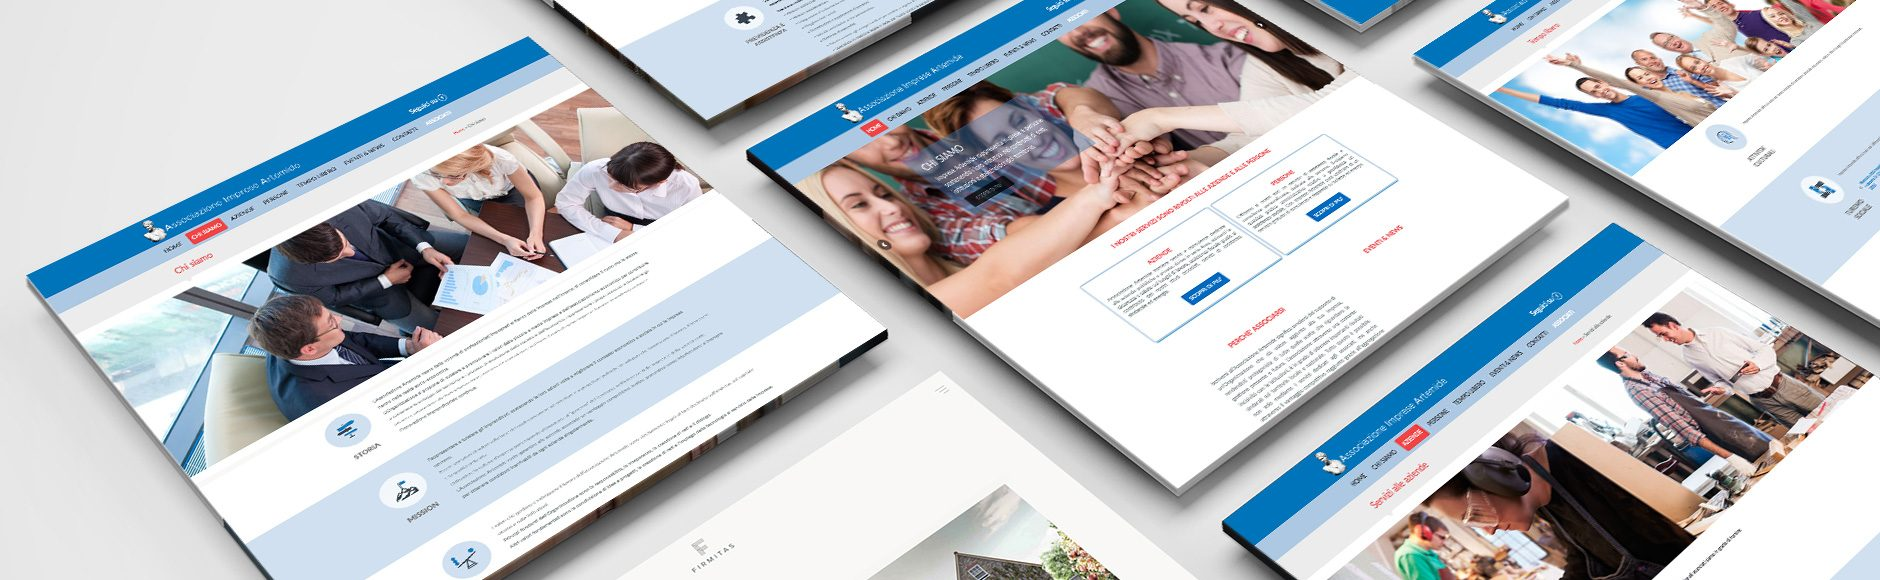 portfolio-associazioneimpreseartemide-top